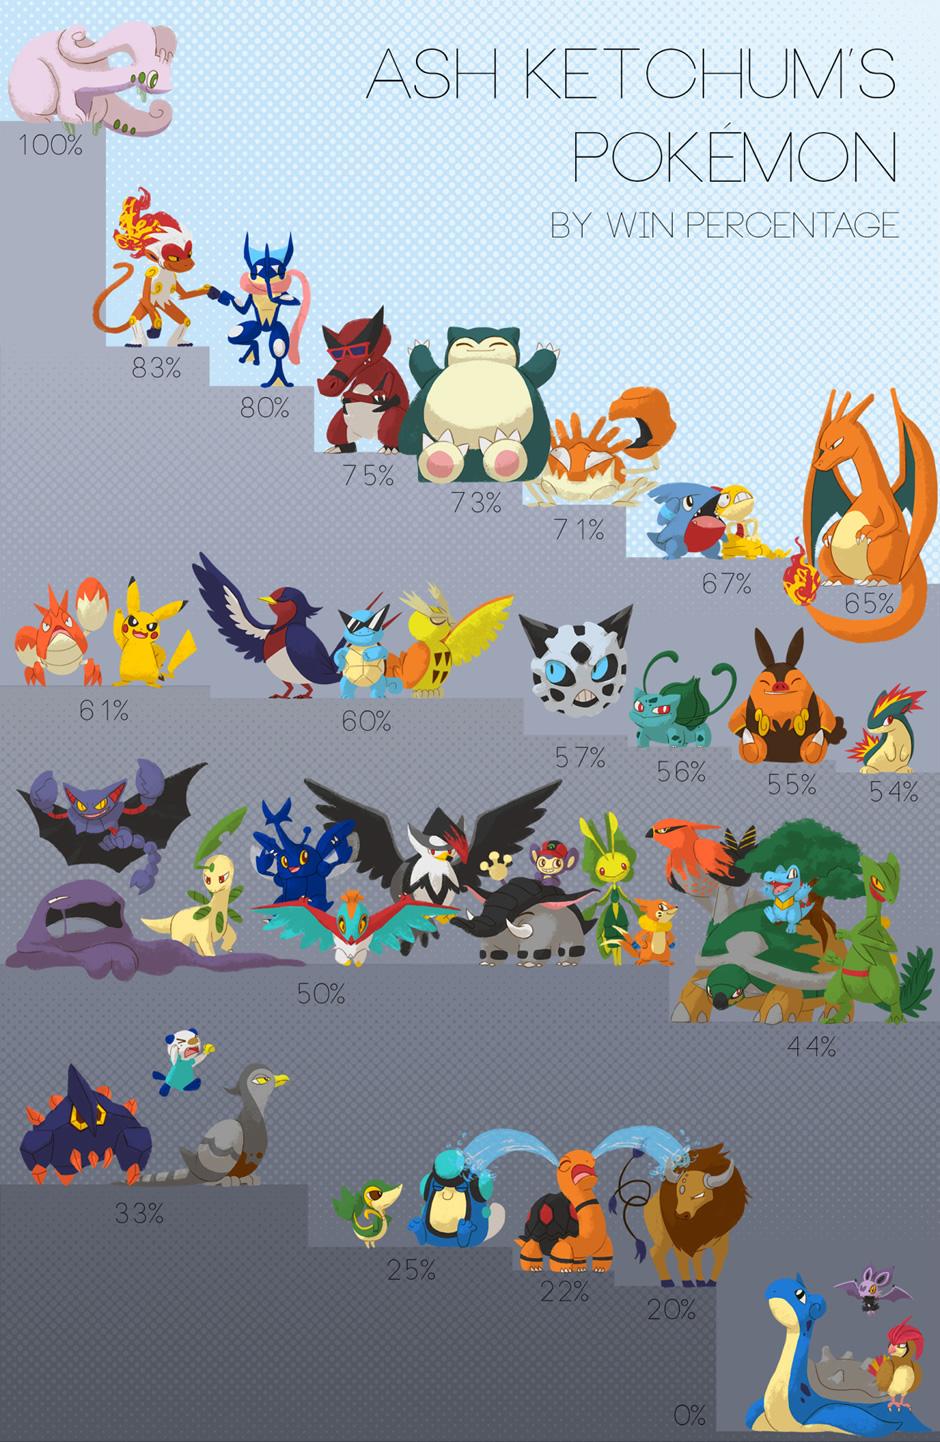 pokemon ash vitoria ganharam